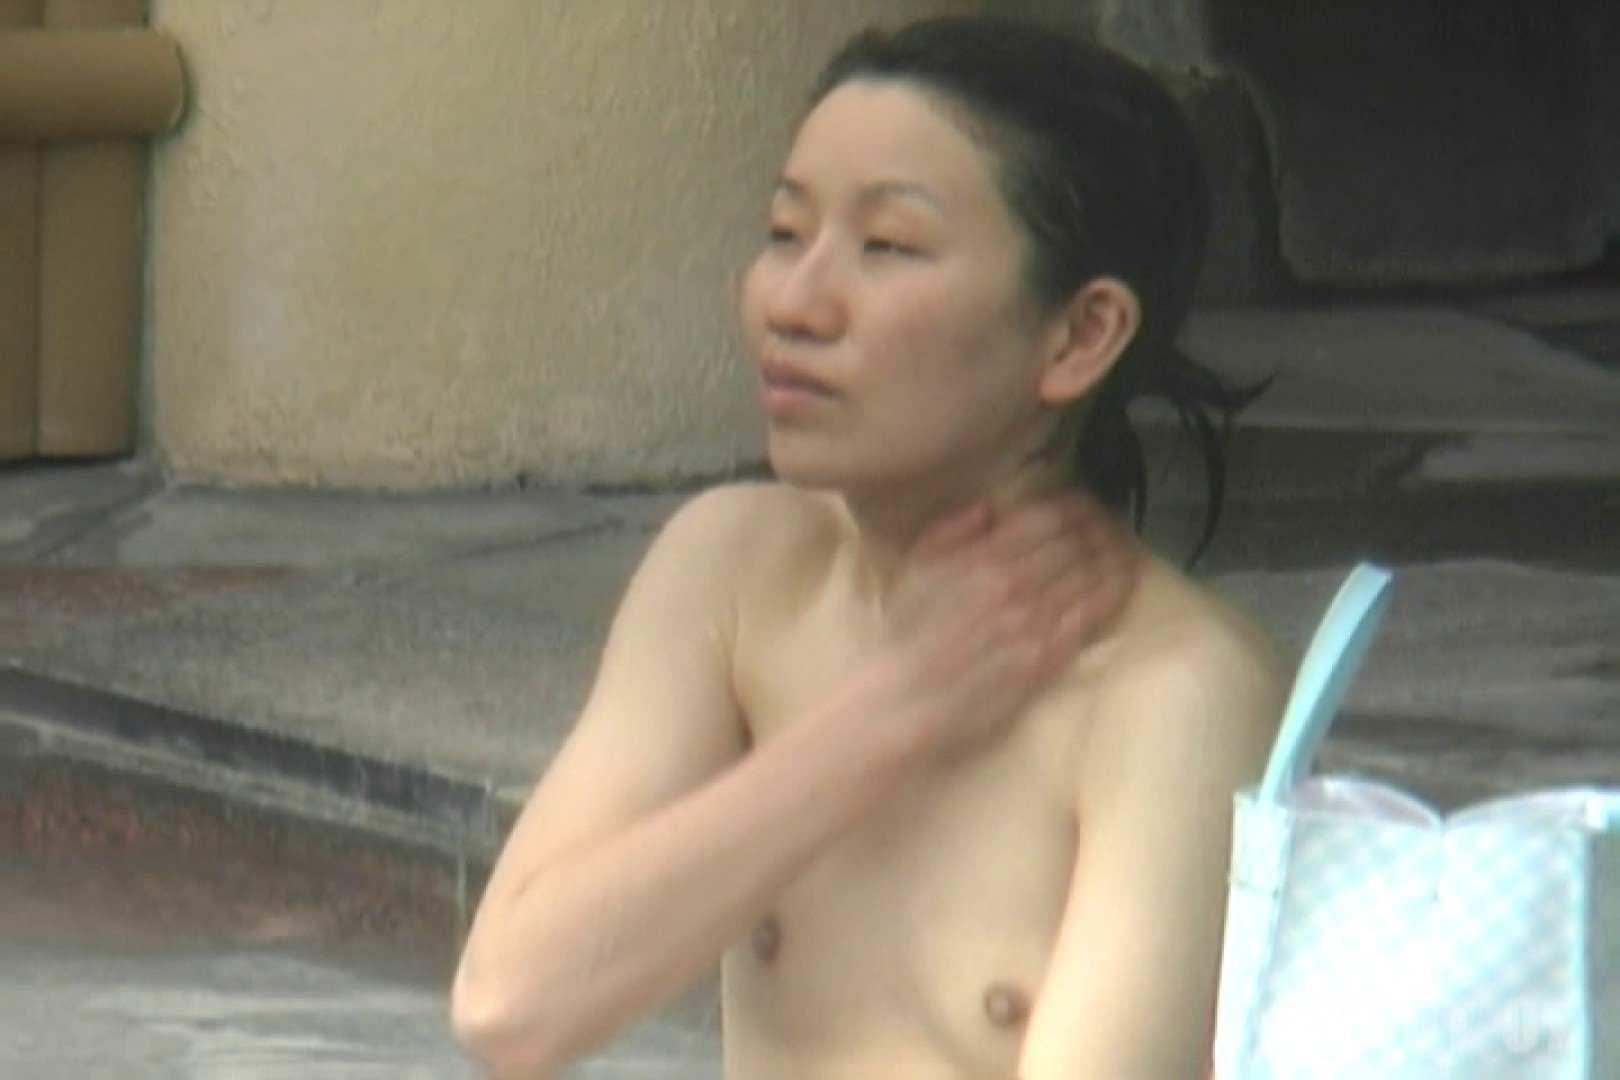 Aquaな露天風呂Vol.769 盗撮師作品 エロ無料画像 71pic 32